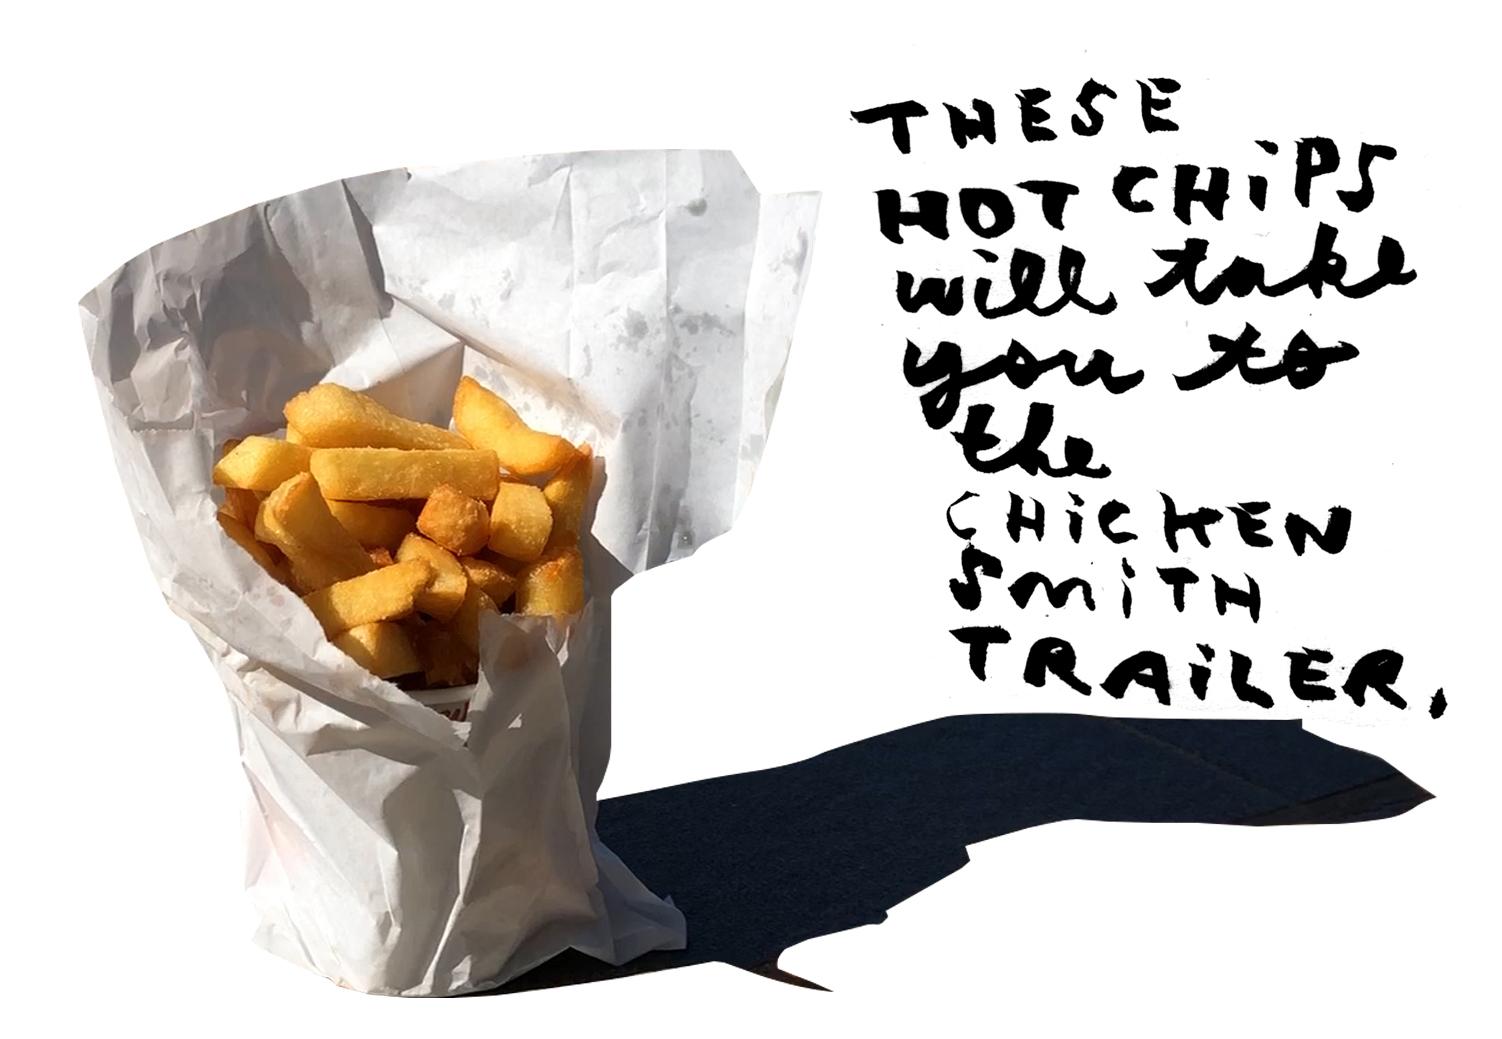 Hot chips photography by Geoff Lloyd.